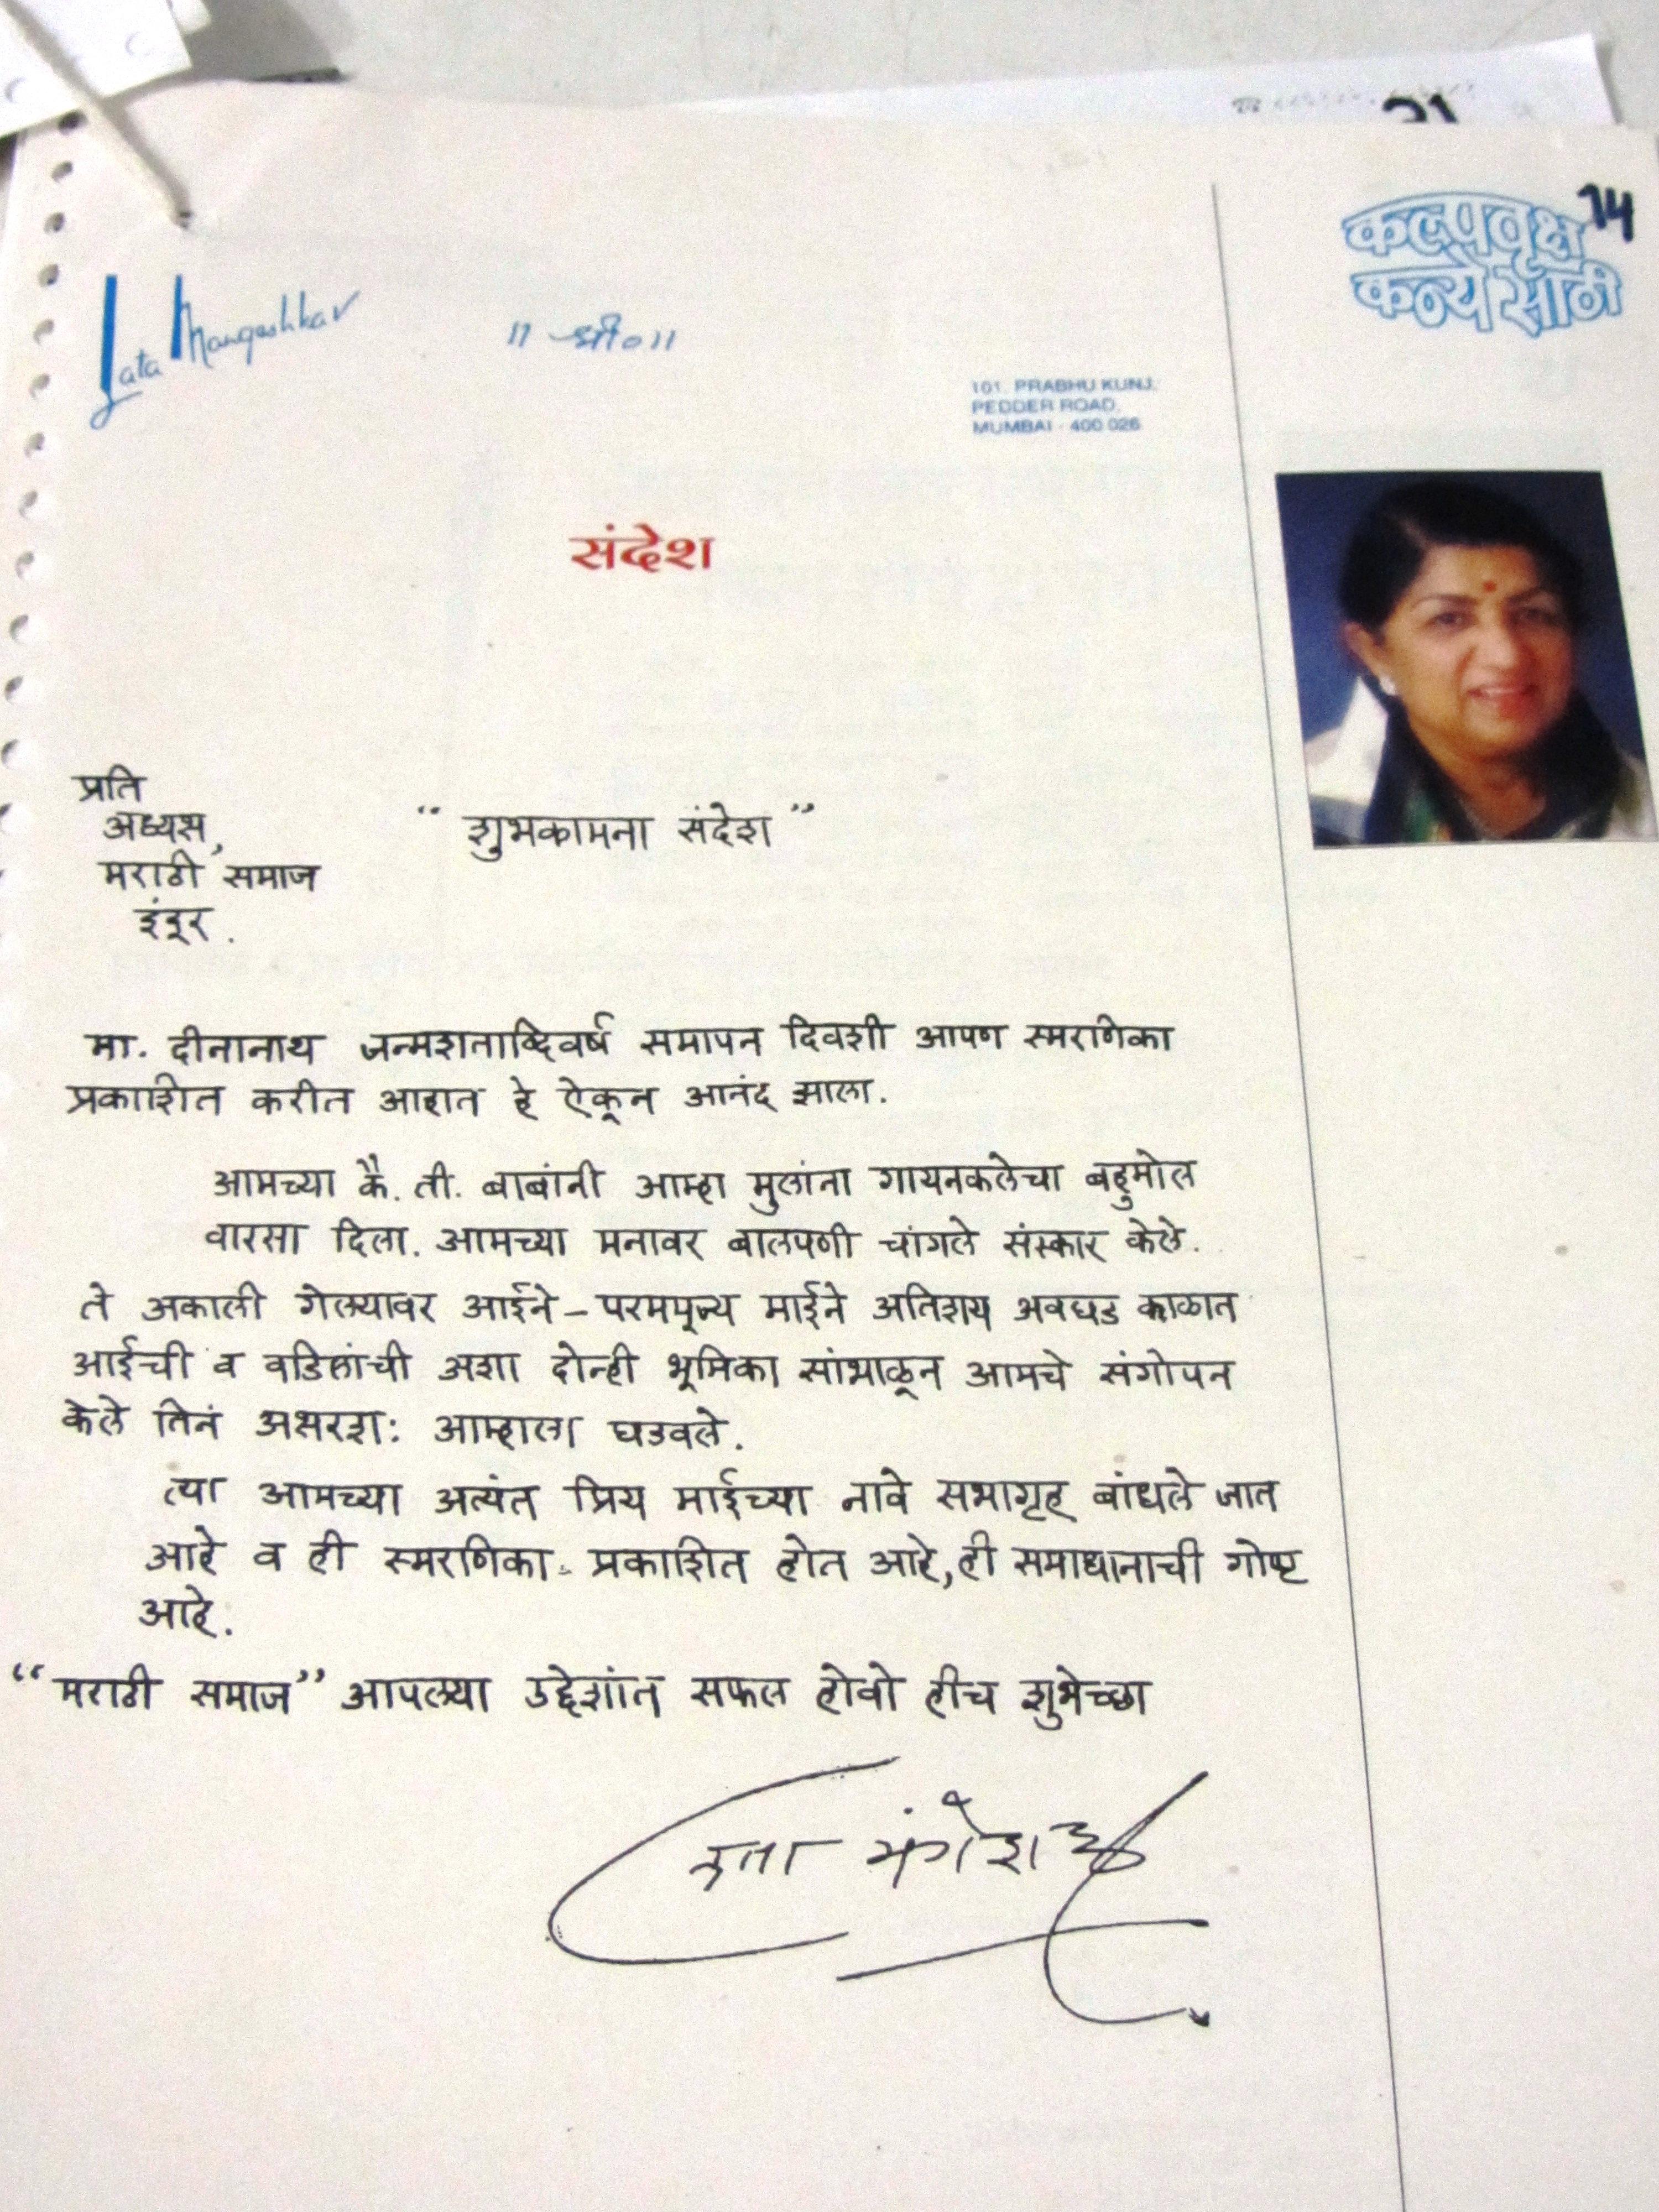 Letter by Lata Mangeshkar